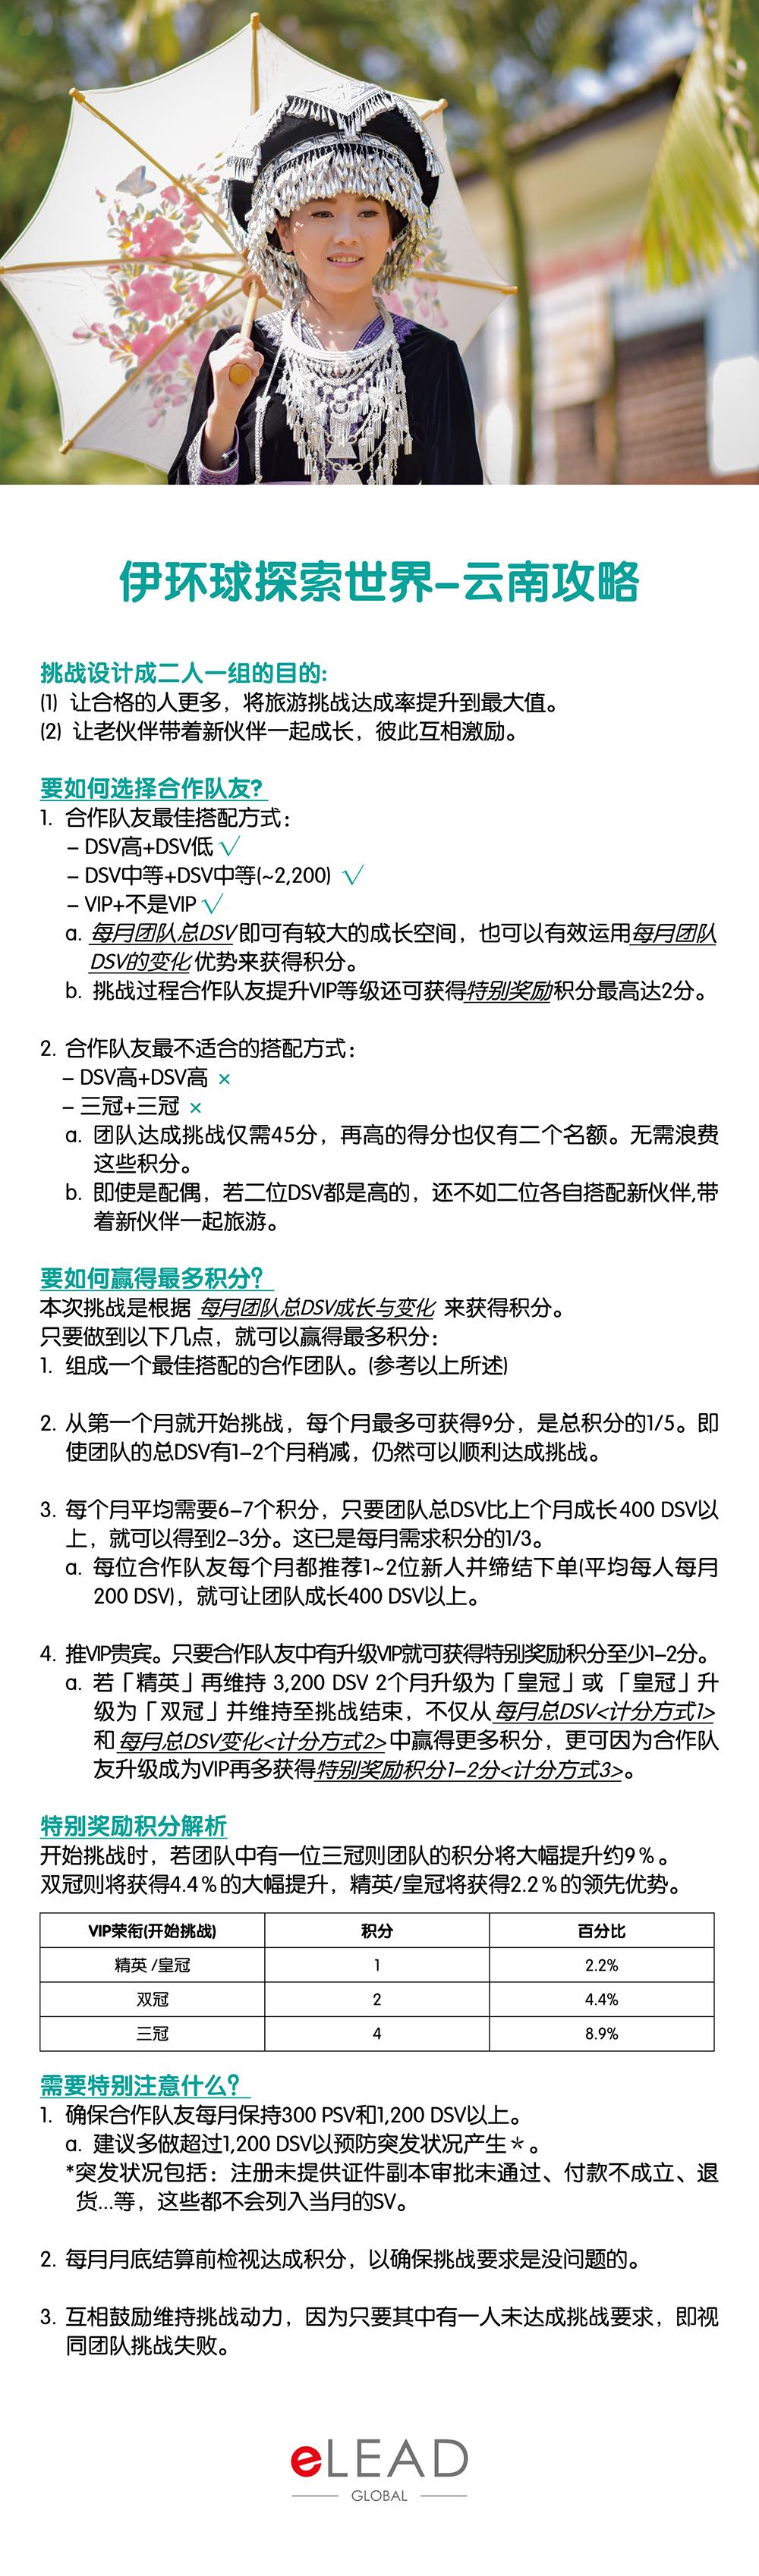 12-07_yunan_strategy_guide_cn